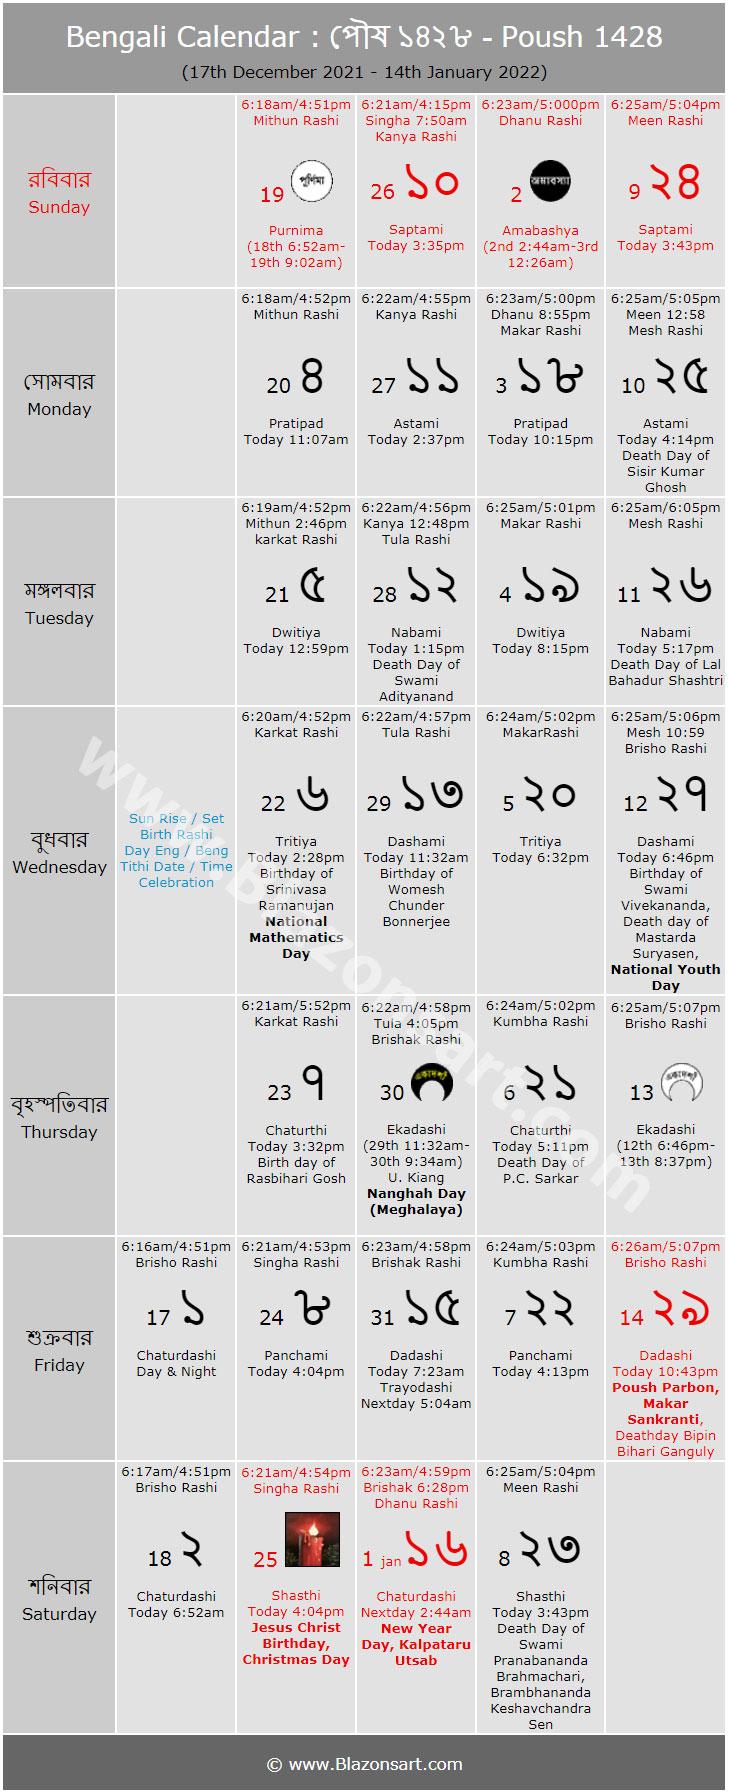 Bengali Calendar - Poush 1426 : বাংলা কালেন্ডার